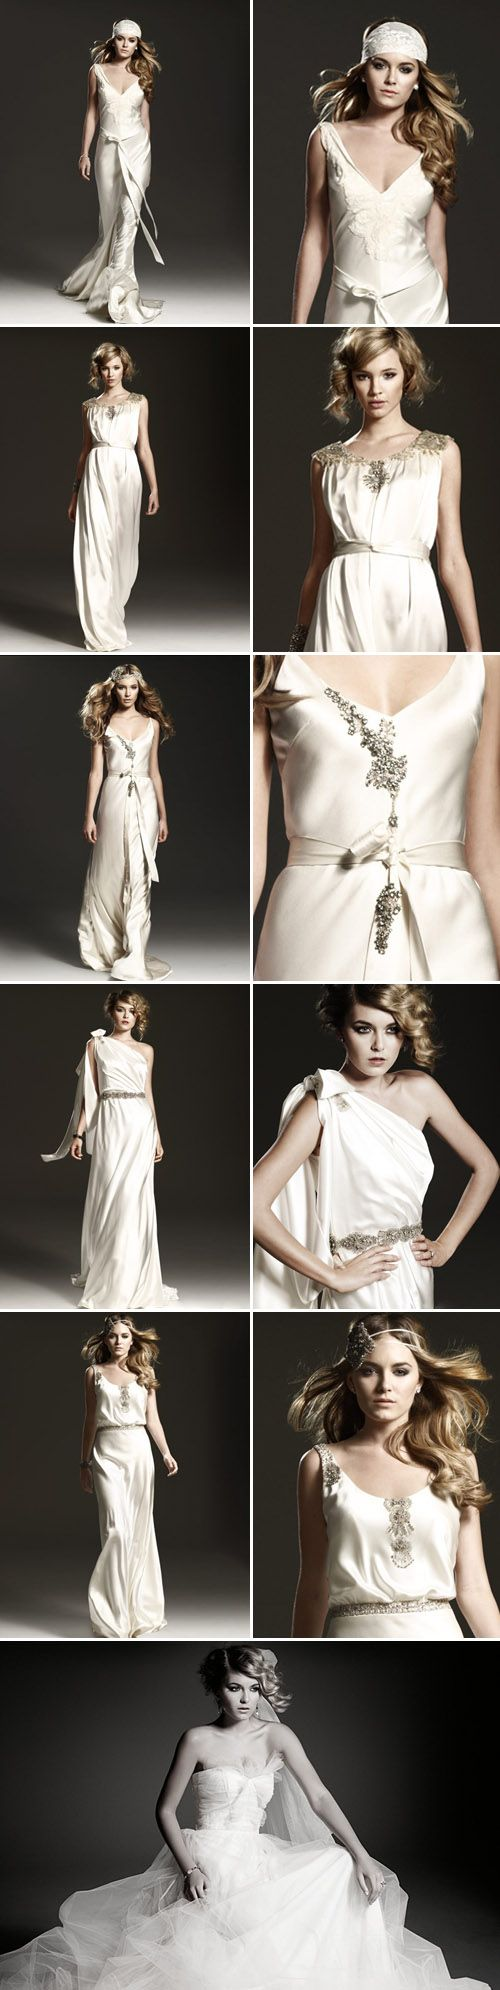 Glamorous Wedding Dresses from Johanna Johnson - Junebug's Wedding Blog